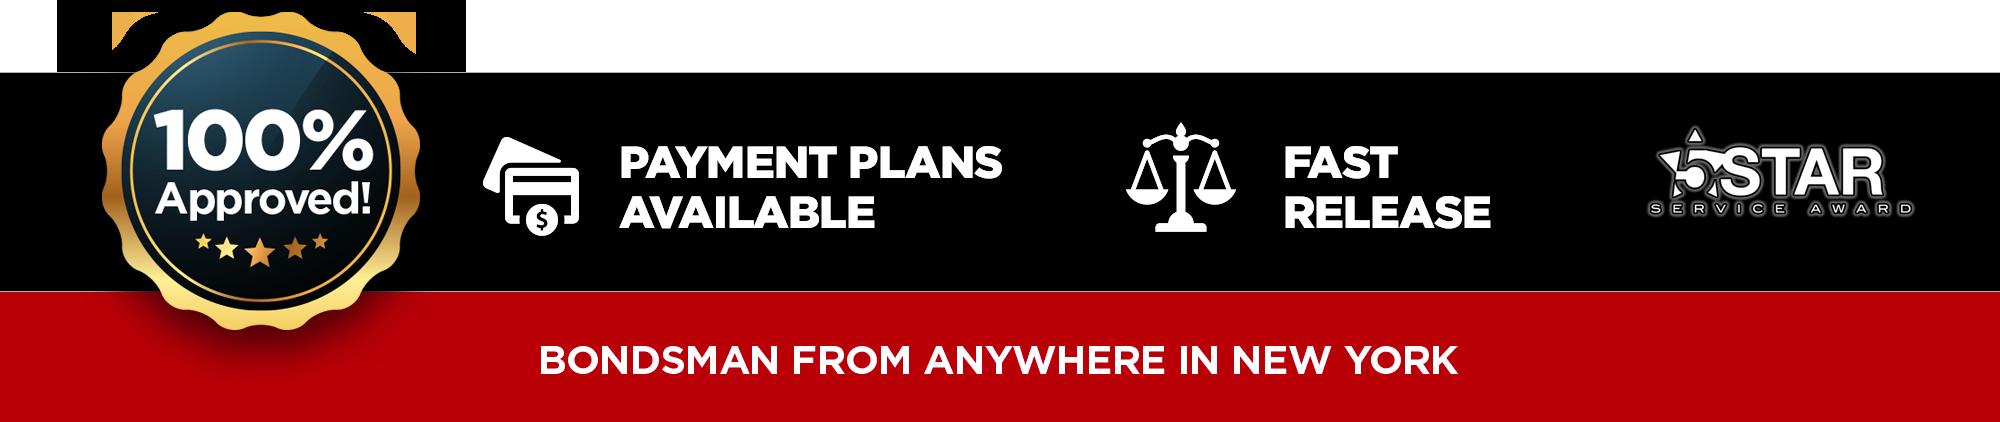 Dauphin County Pennsylvania Bail Bonds | 717-366-6611 | Above All